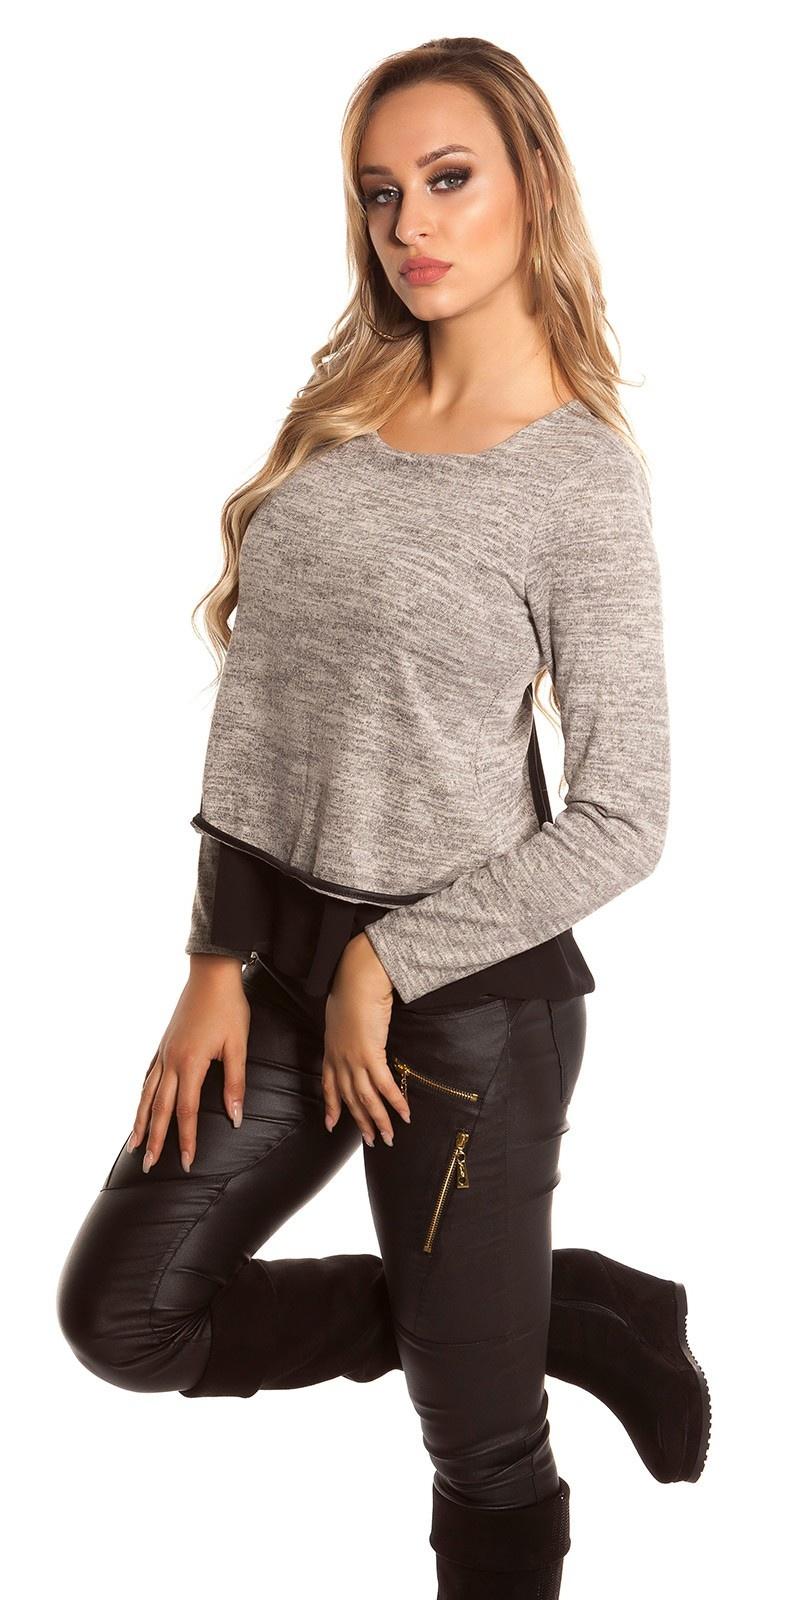 Sexy 2in1 KouCla sweater with Chiffon Beige